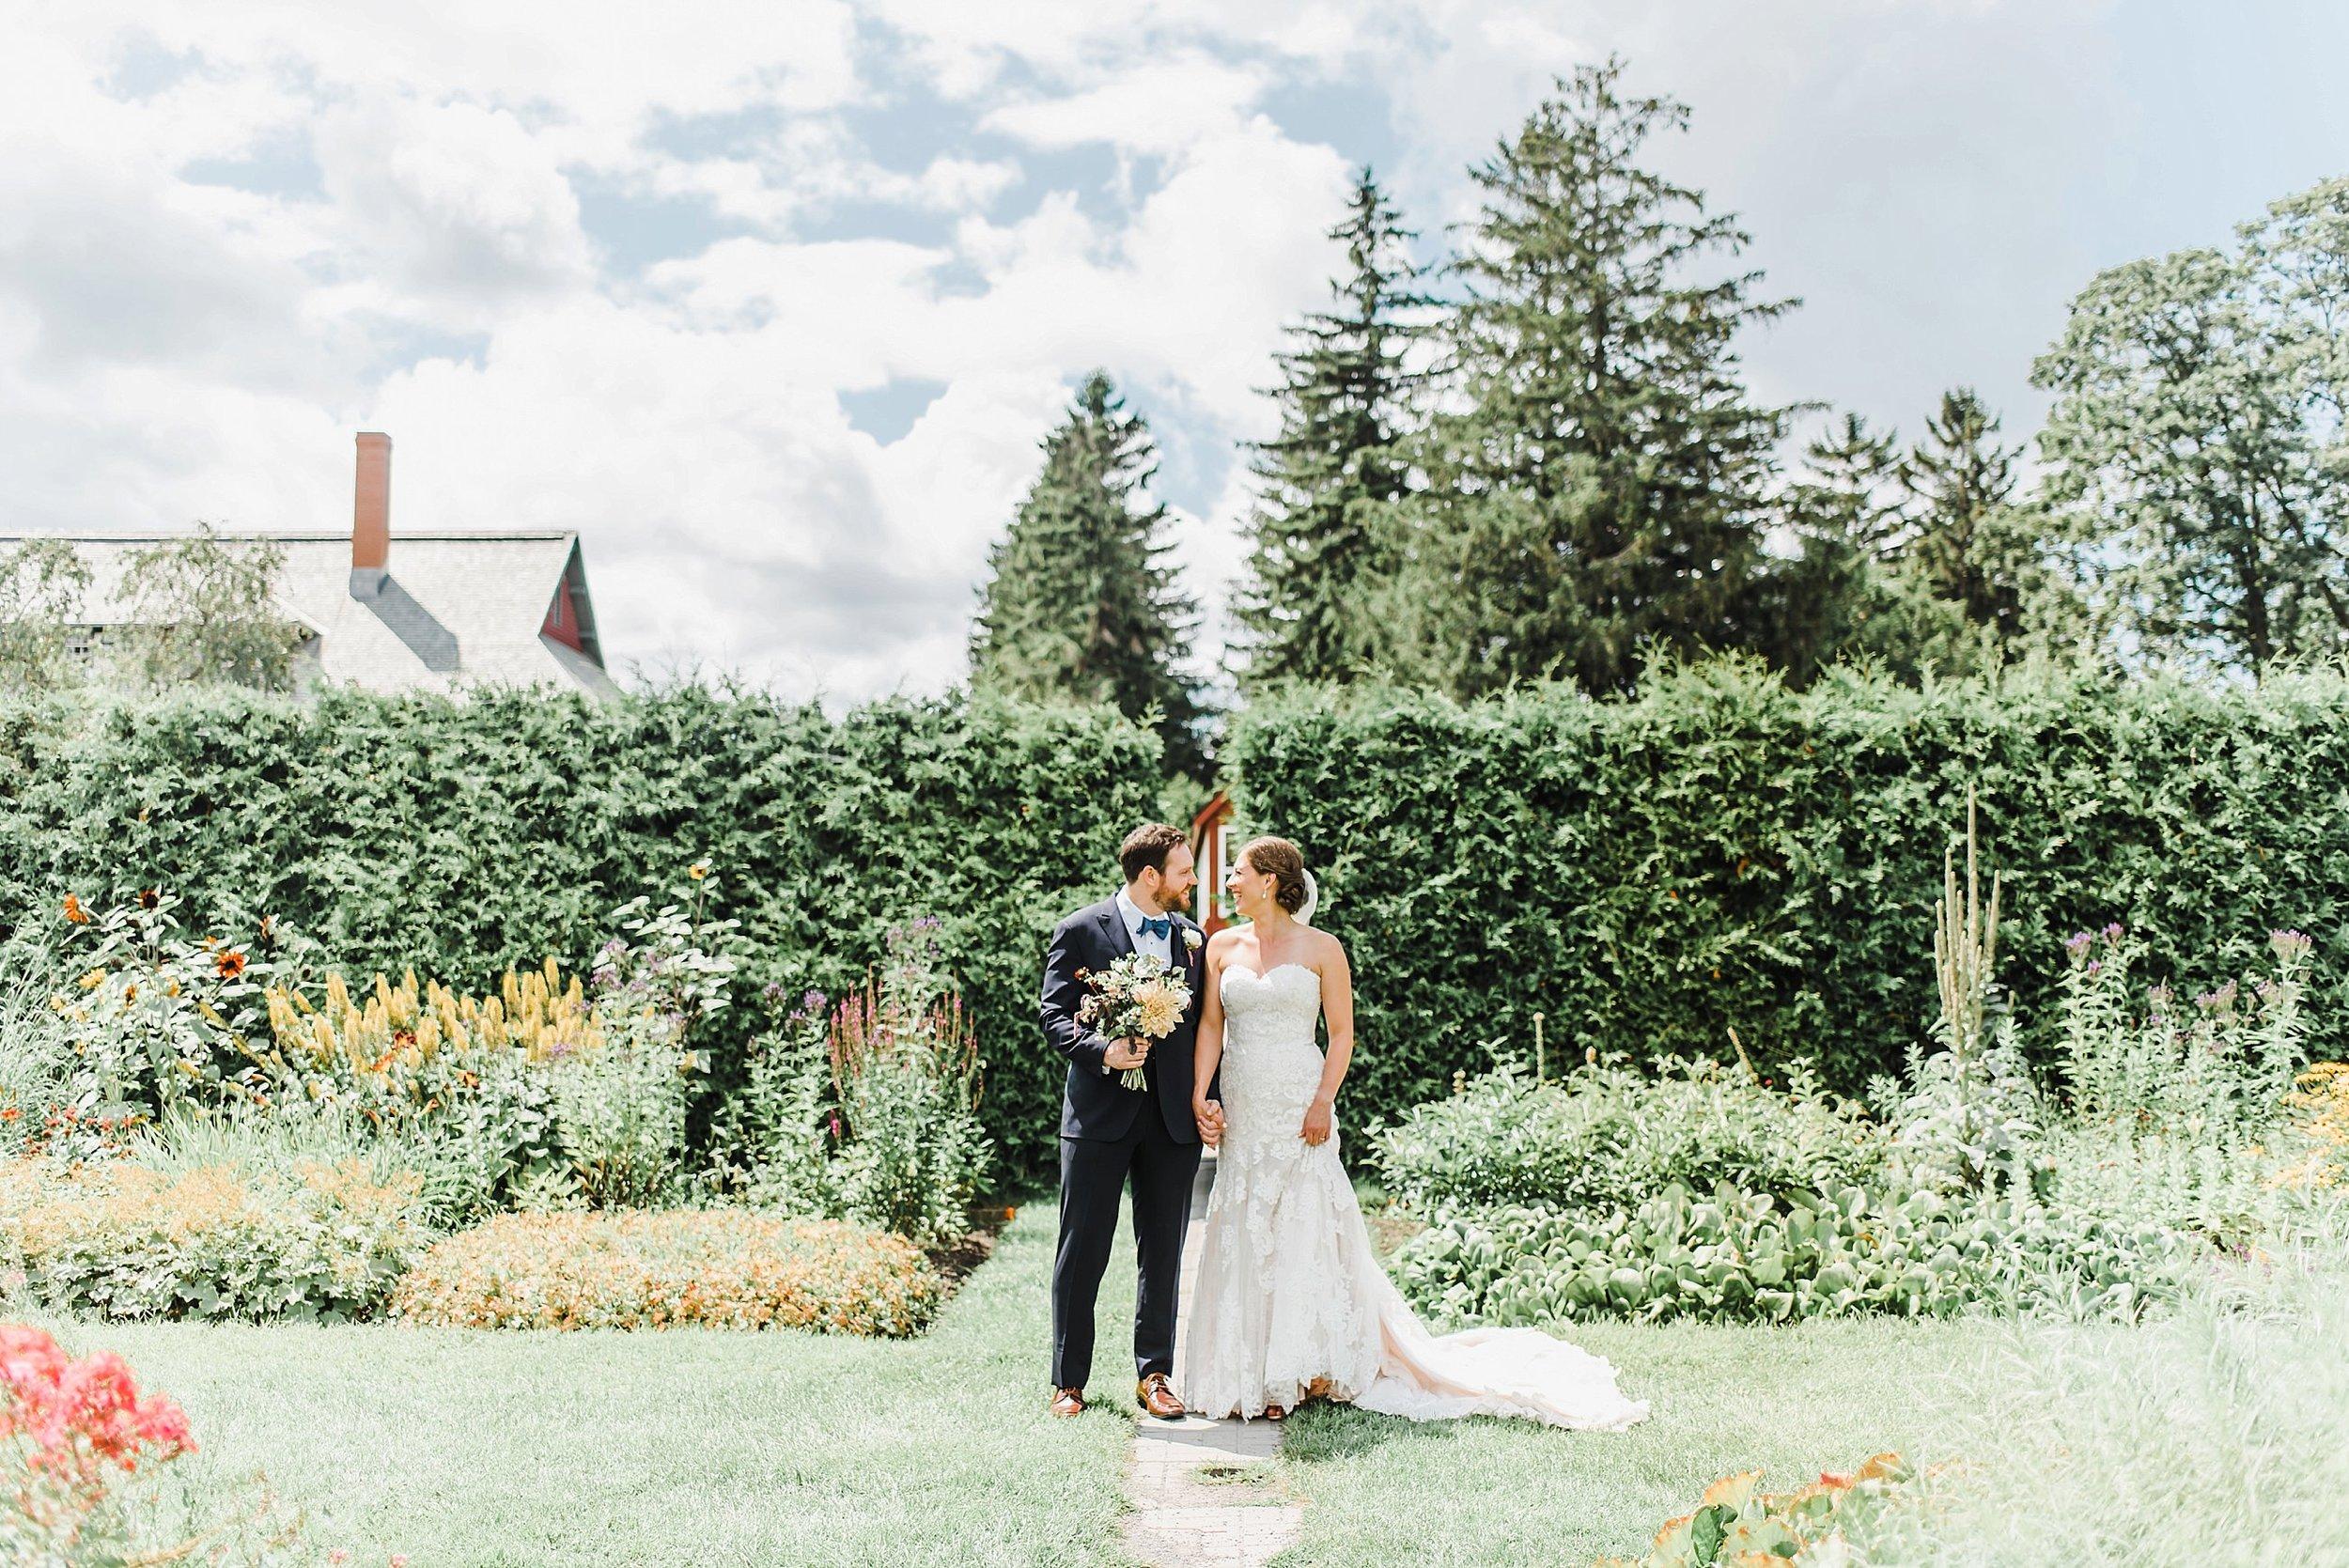 light airy indie fine art ottawa wedding photographer   Ali and Batoul Photography_1010.jpg